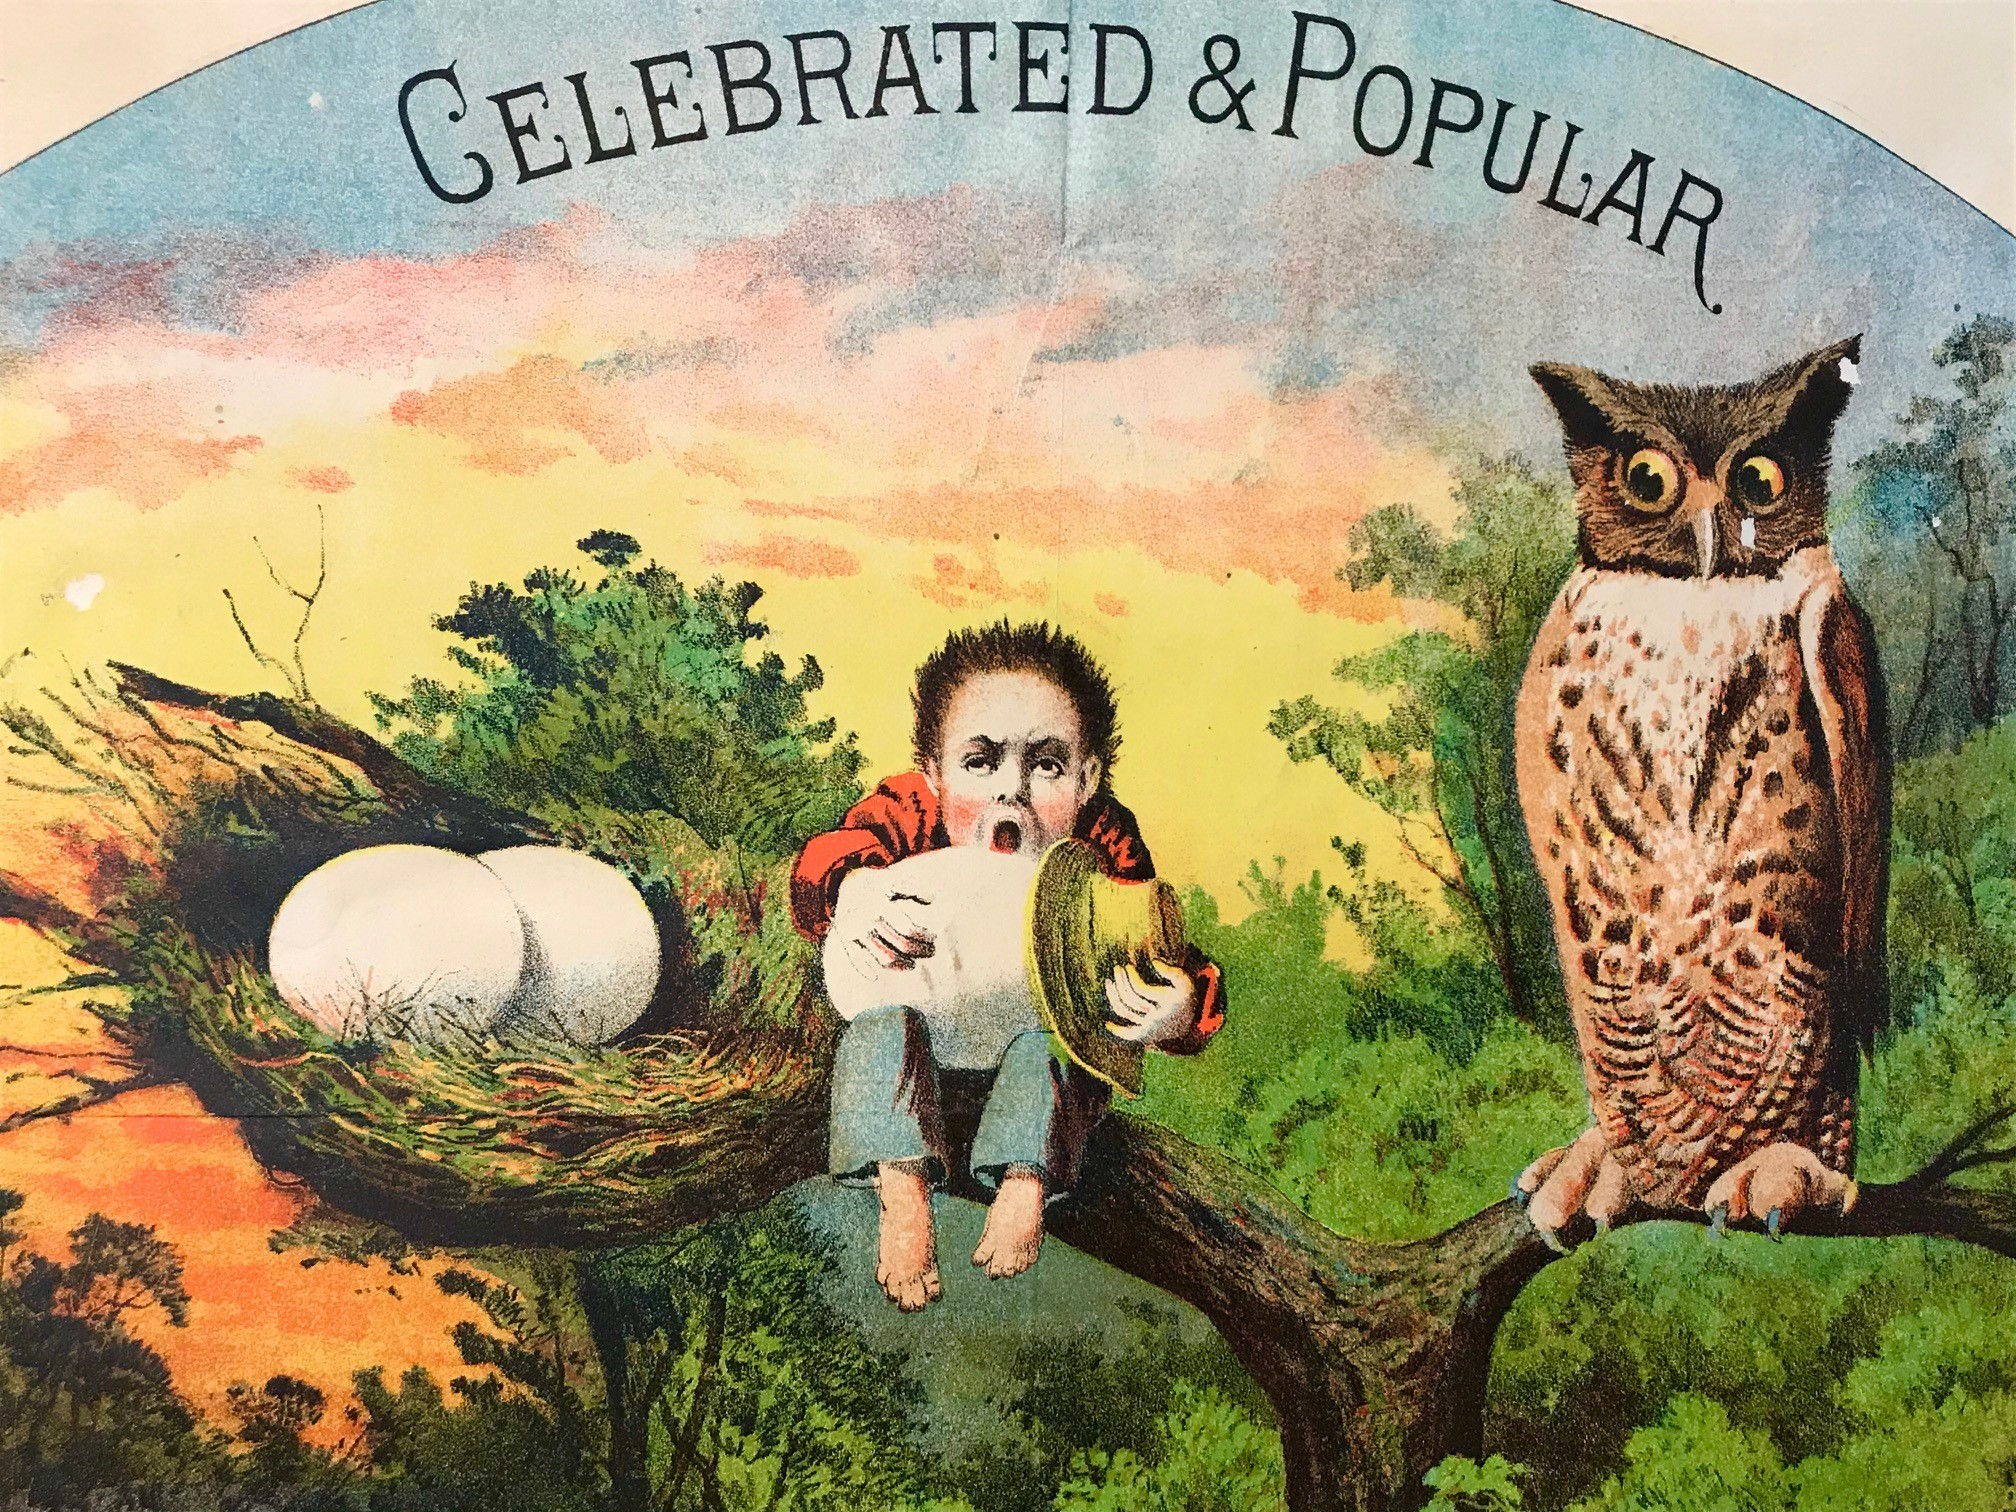 """Celebrated & Popular"" sunrise trade card, 1880s"